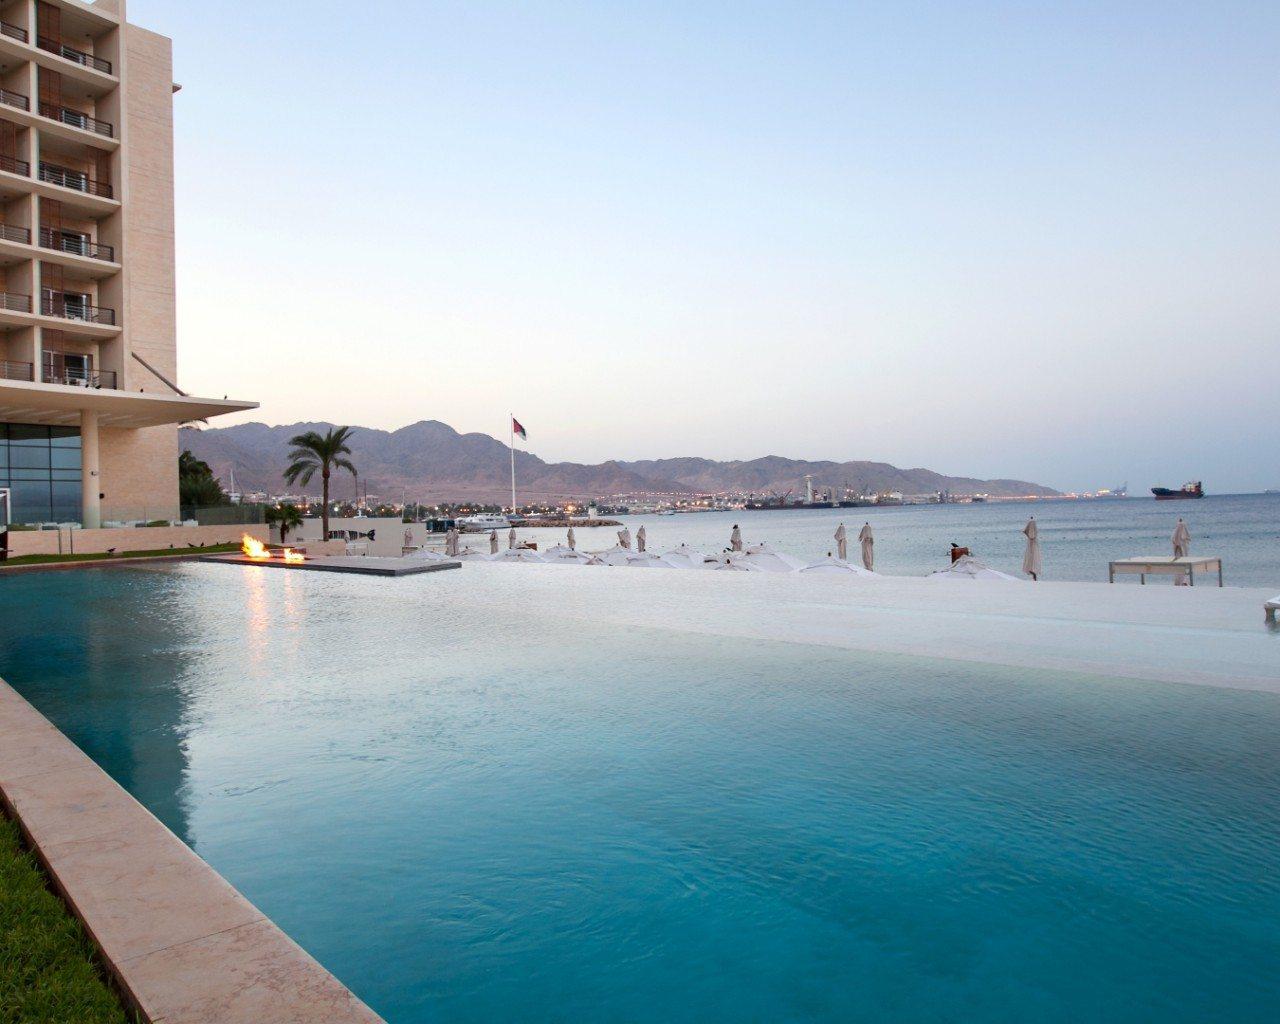 Aqaba Jordan  city pictures gallery : Kempinski Hotel Aqaba, Jordan | Infinity Pools